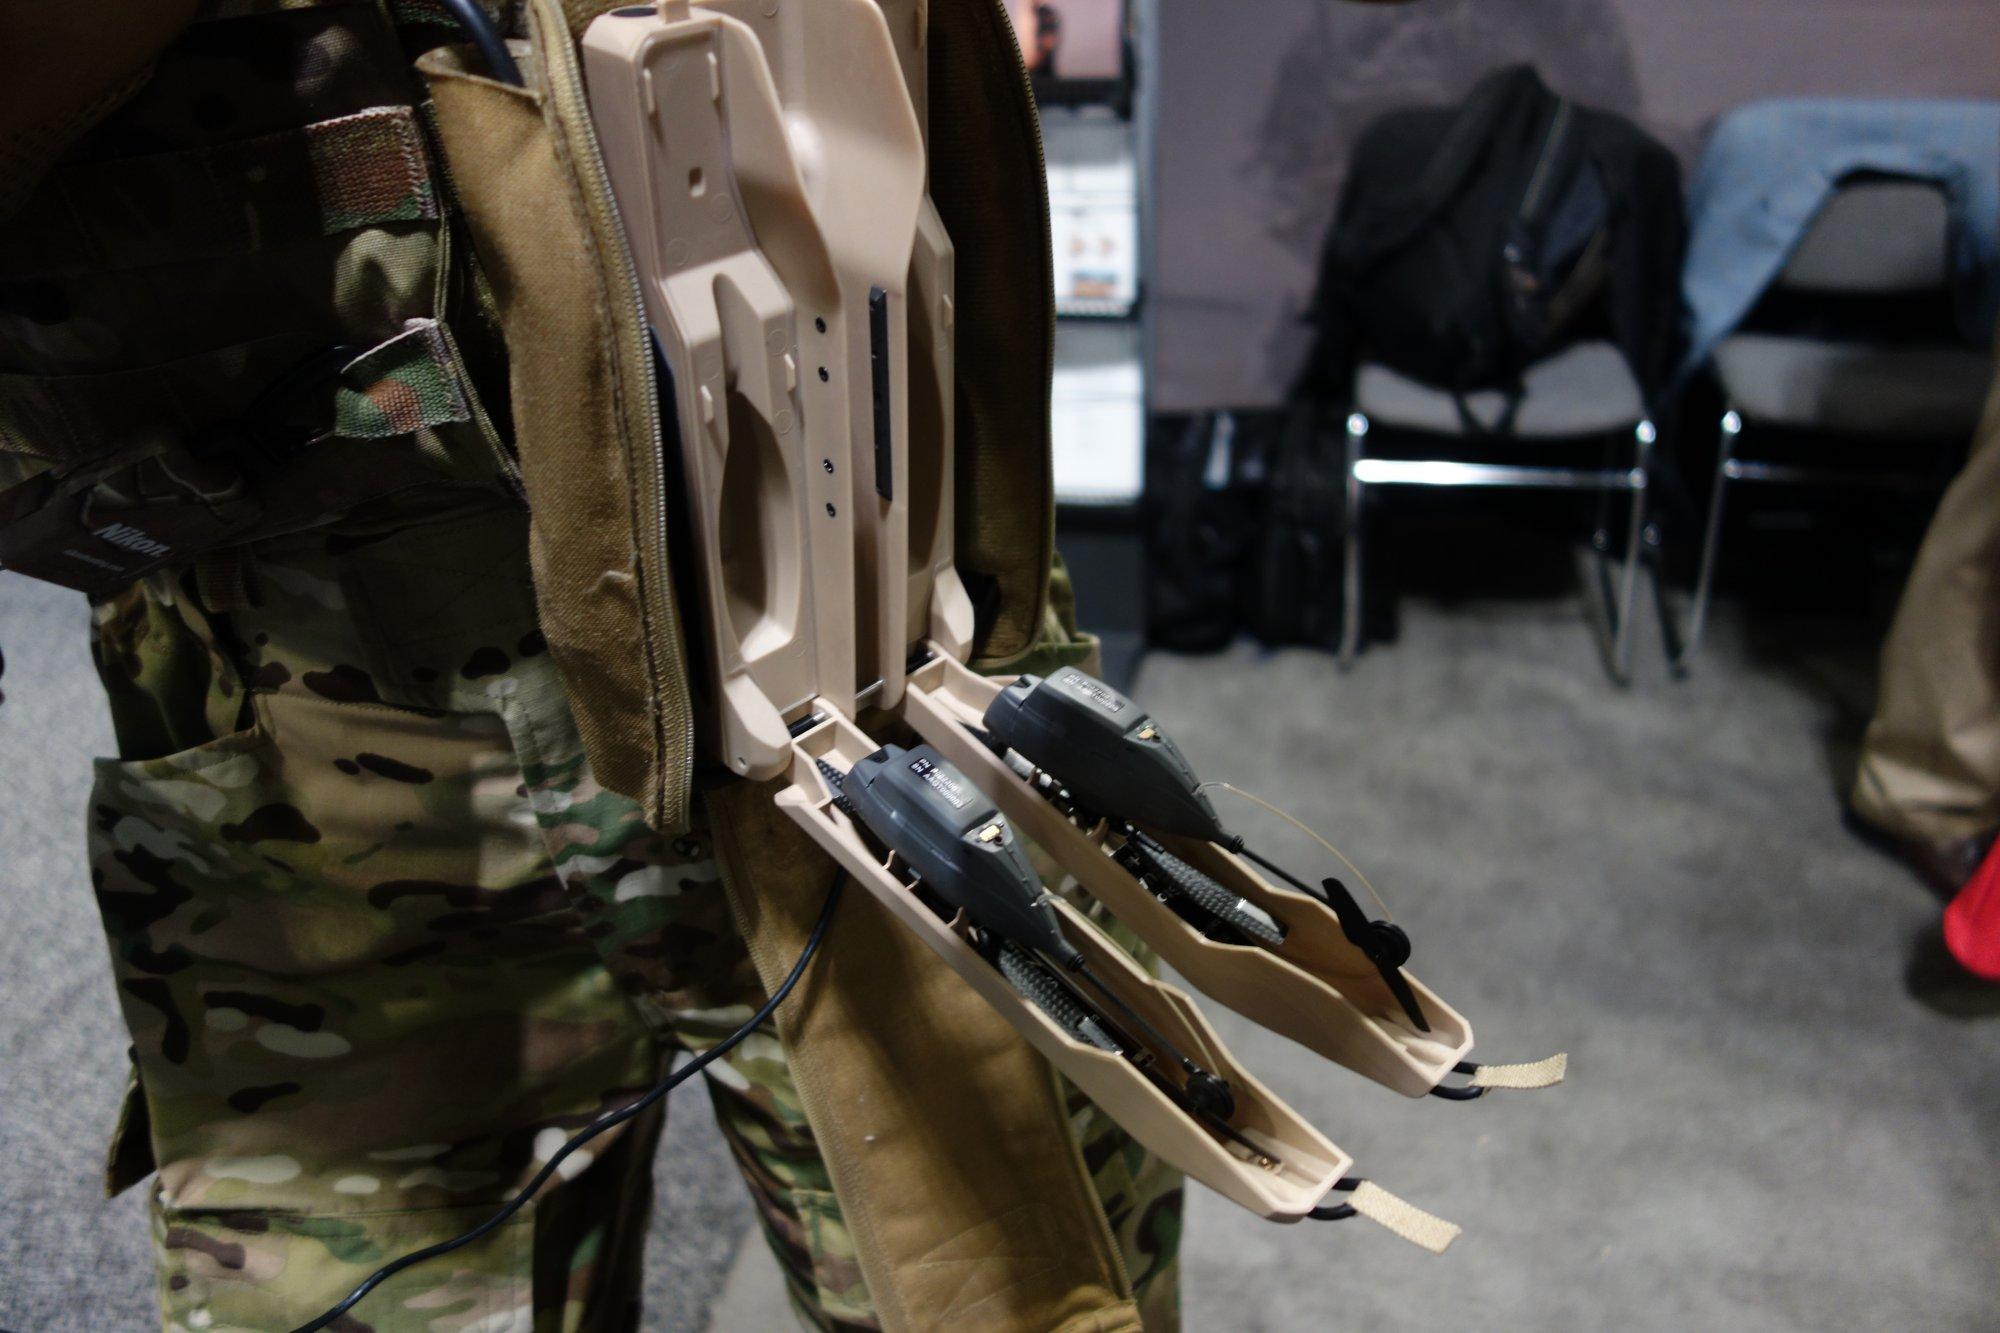 Prox Dynamics Pd 100 Black Hornet Prs Personal